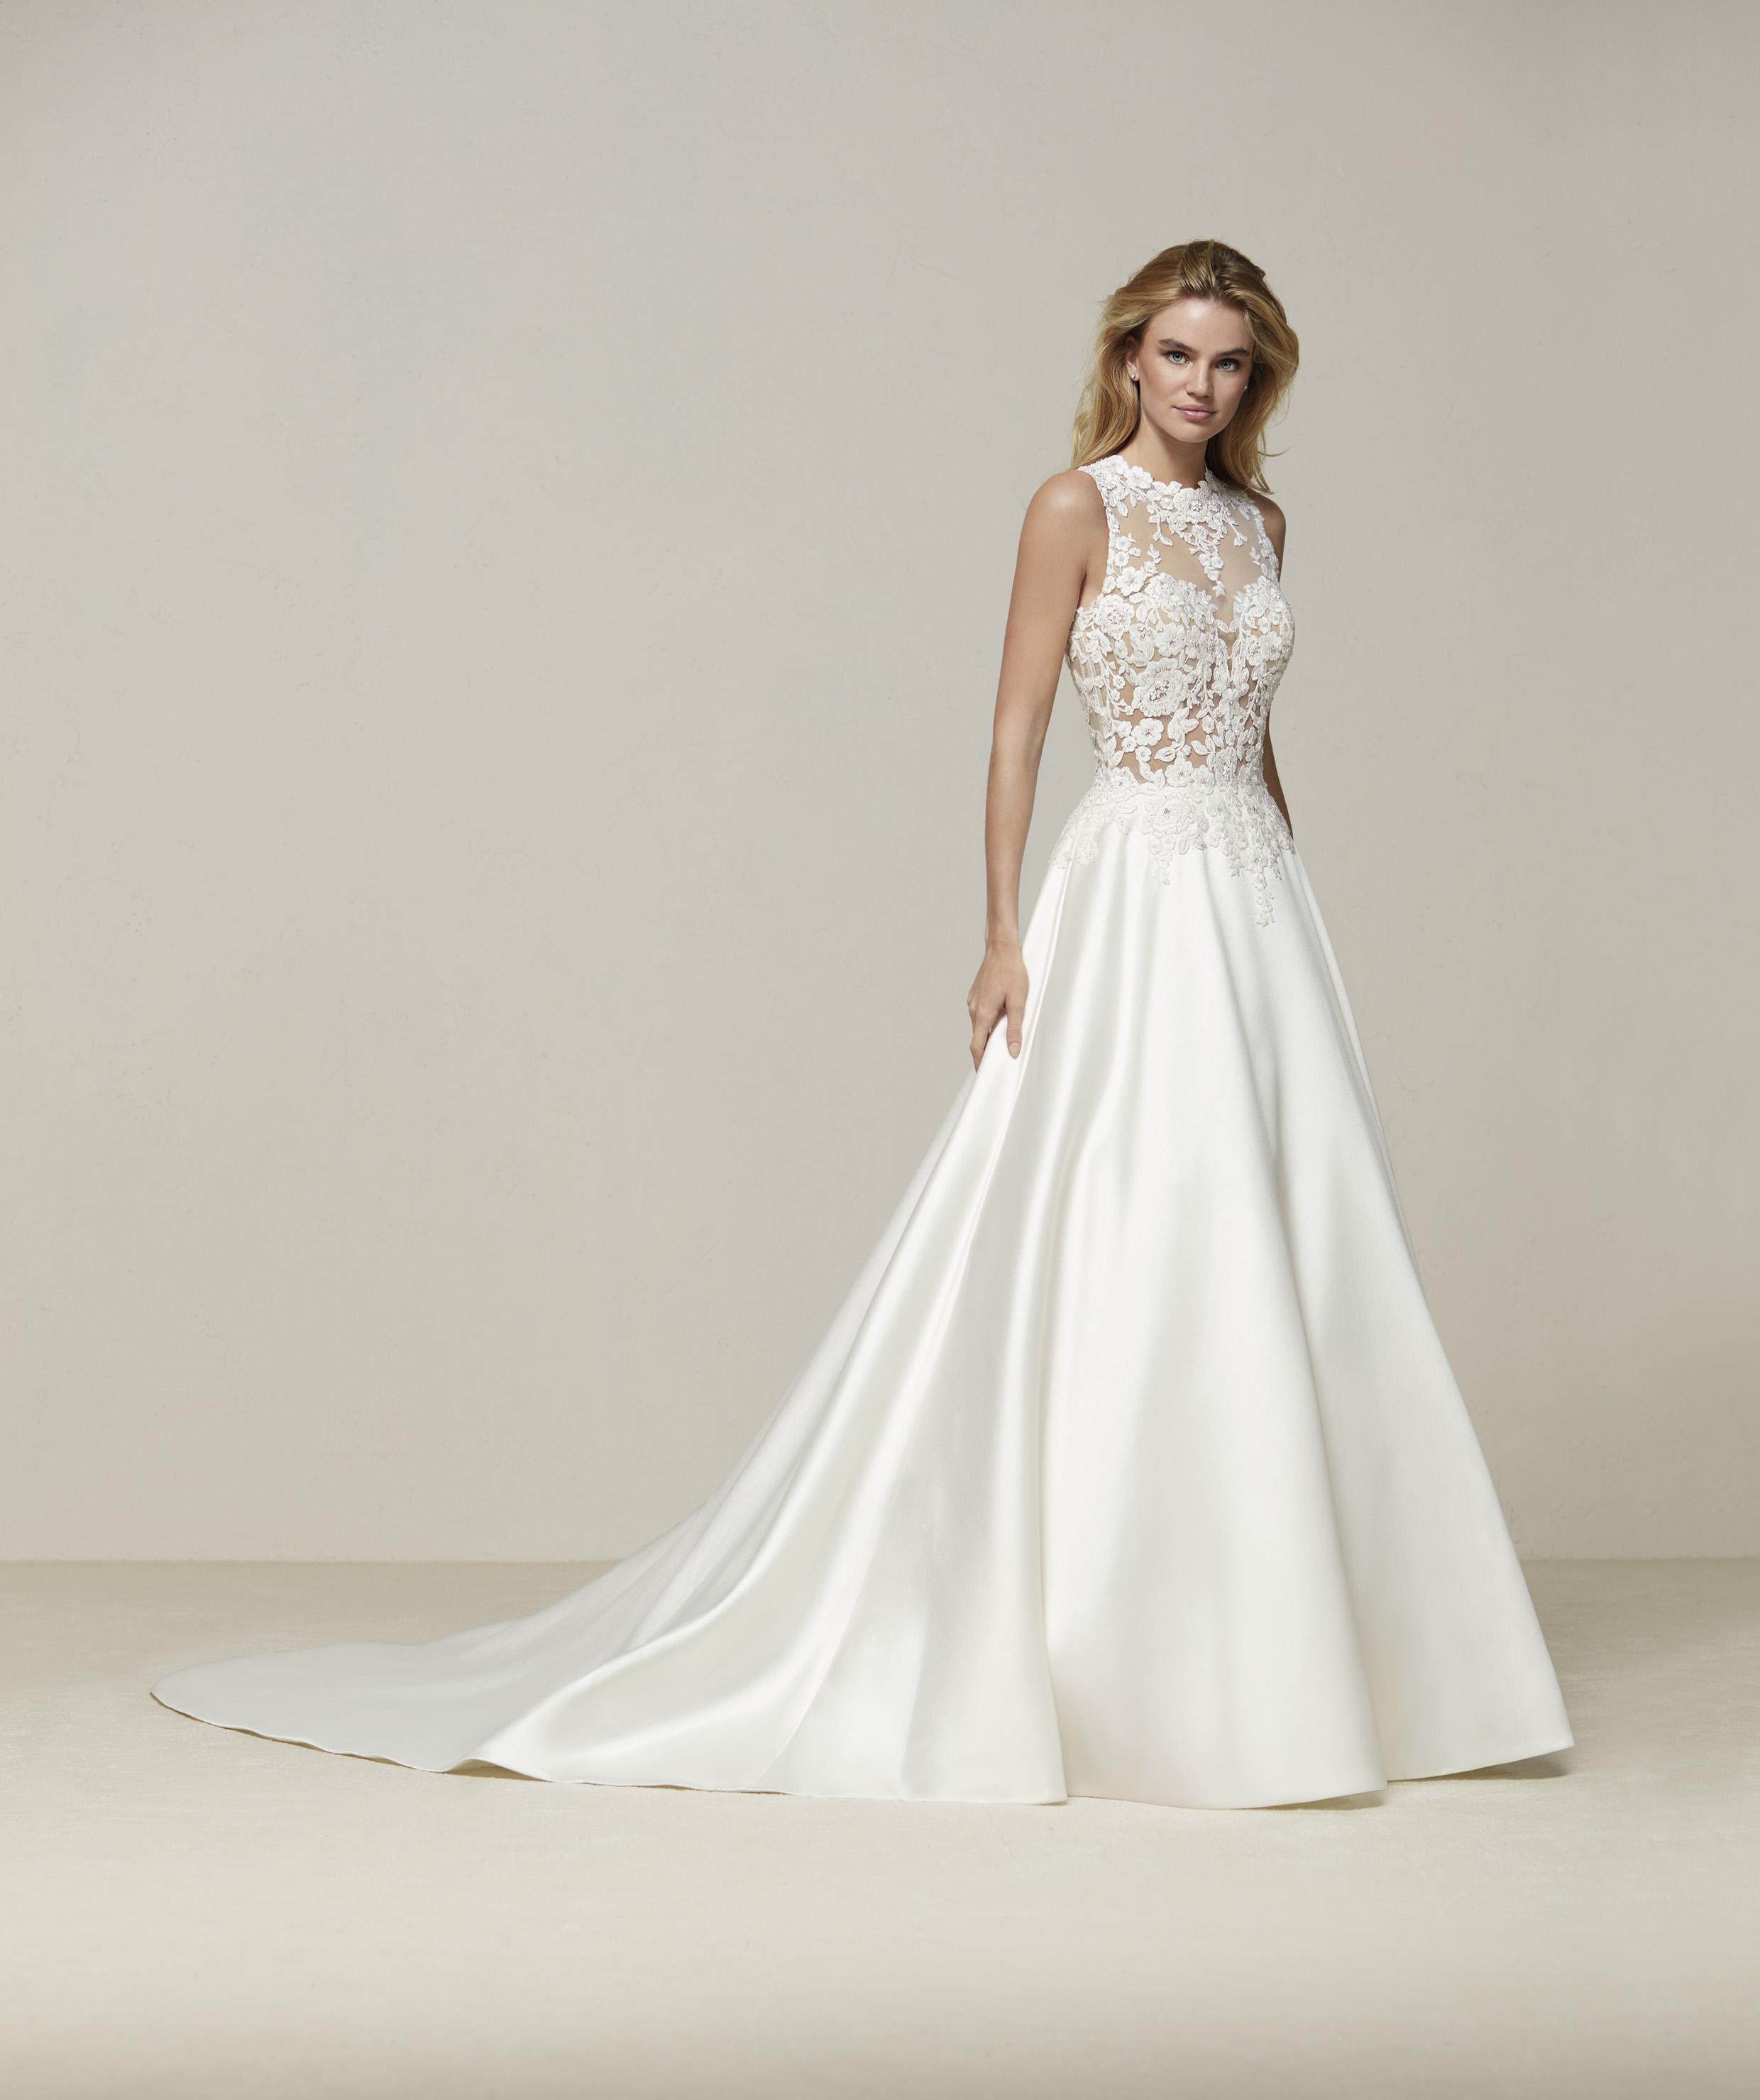 wedding dresses pronovias photo - 1